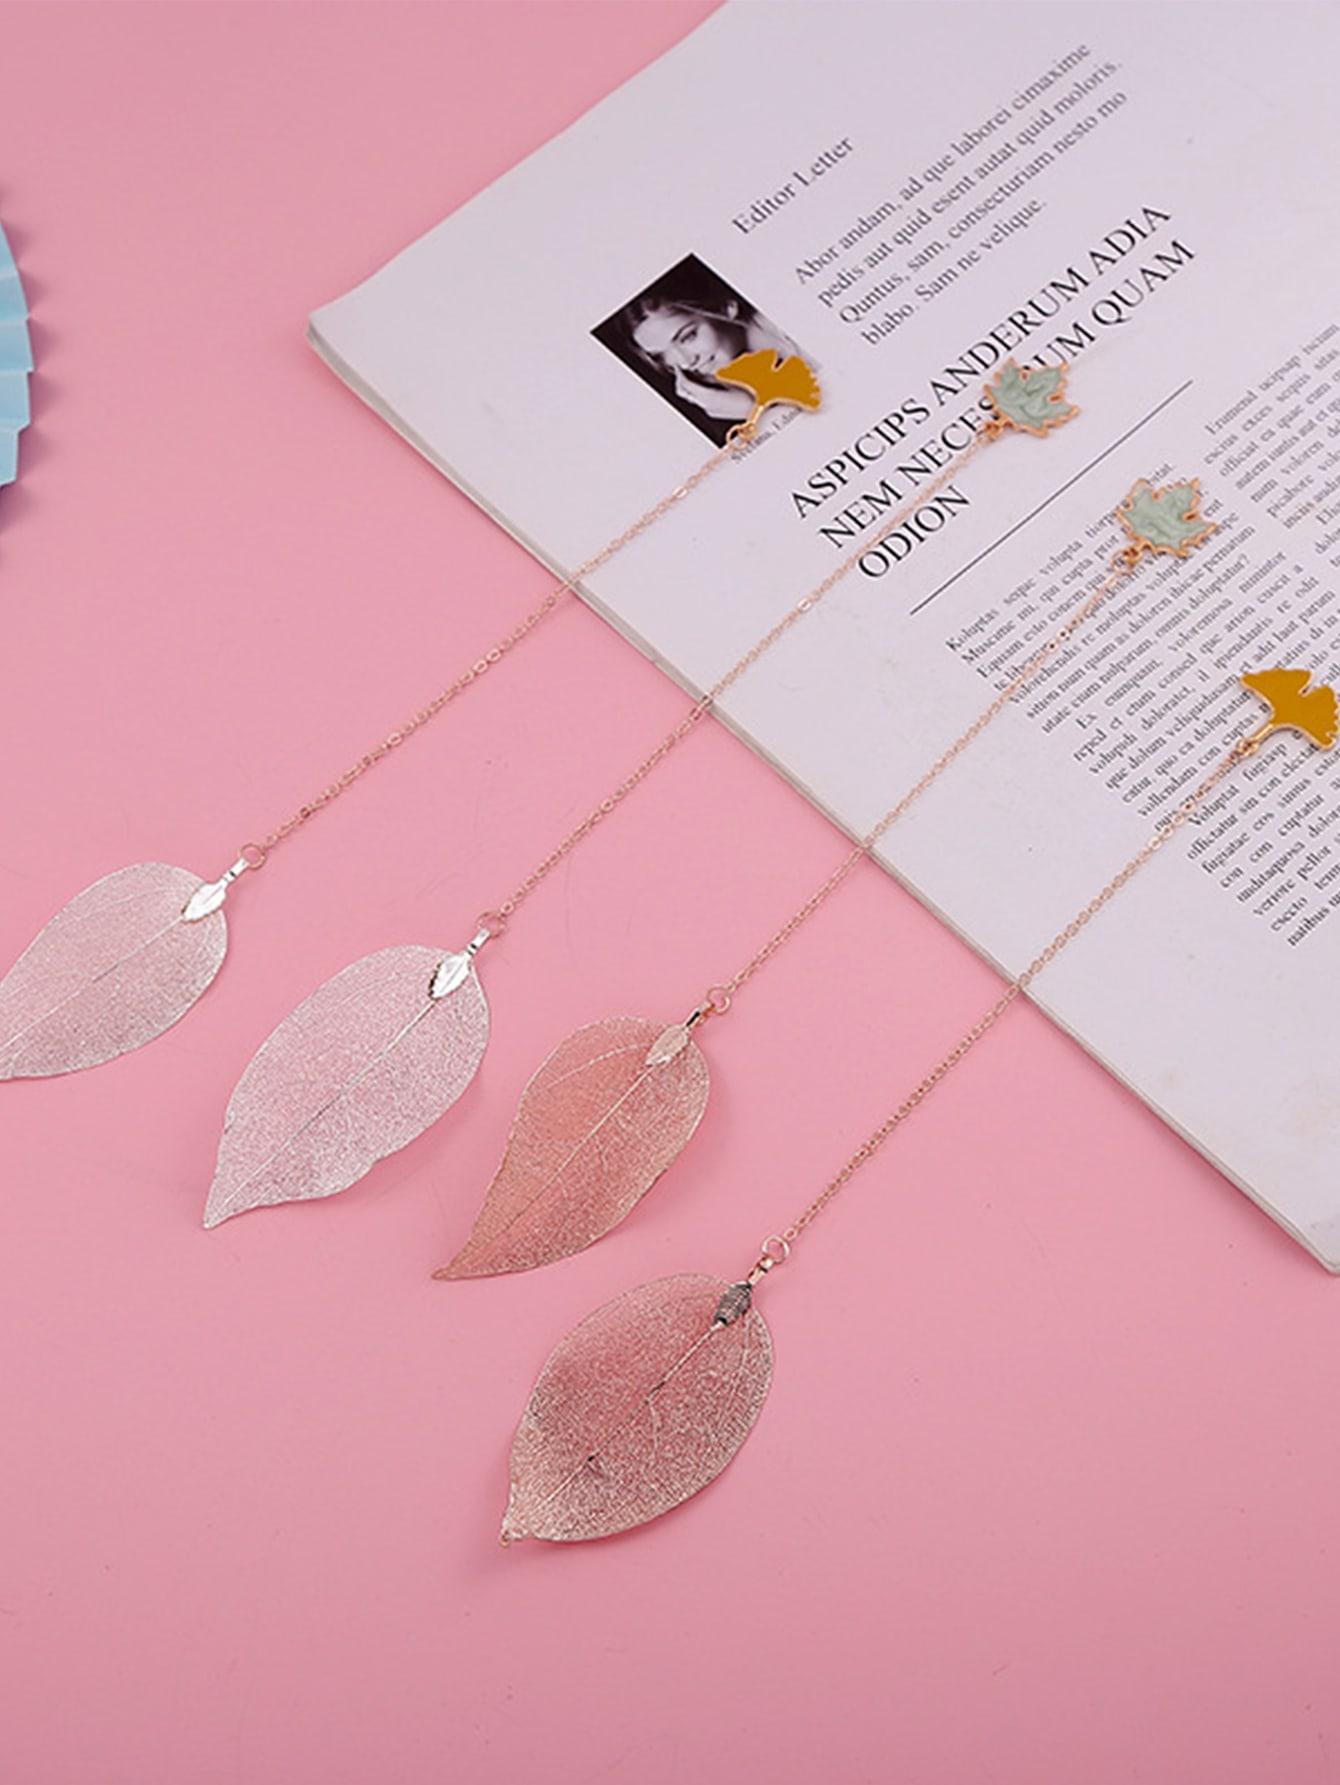 1Pc Leaf Shaped Random Bookmark